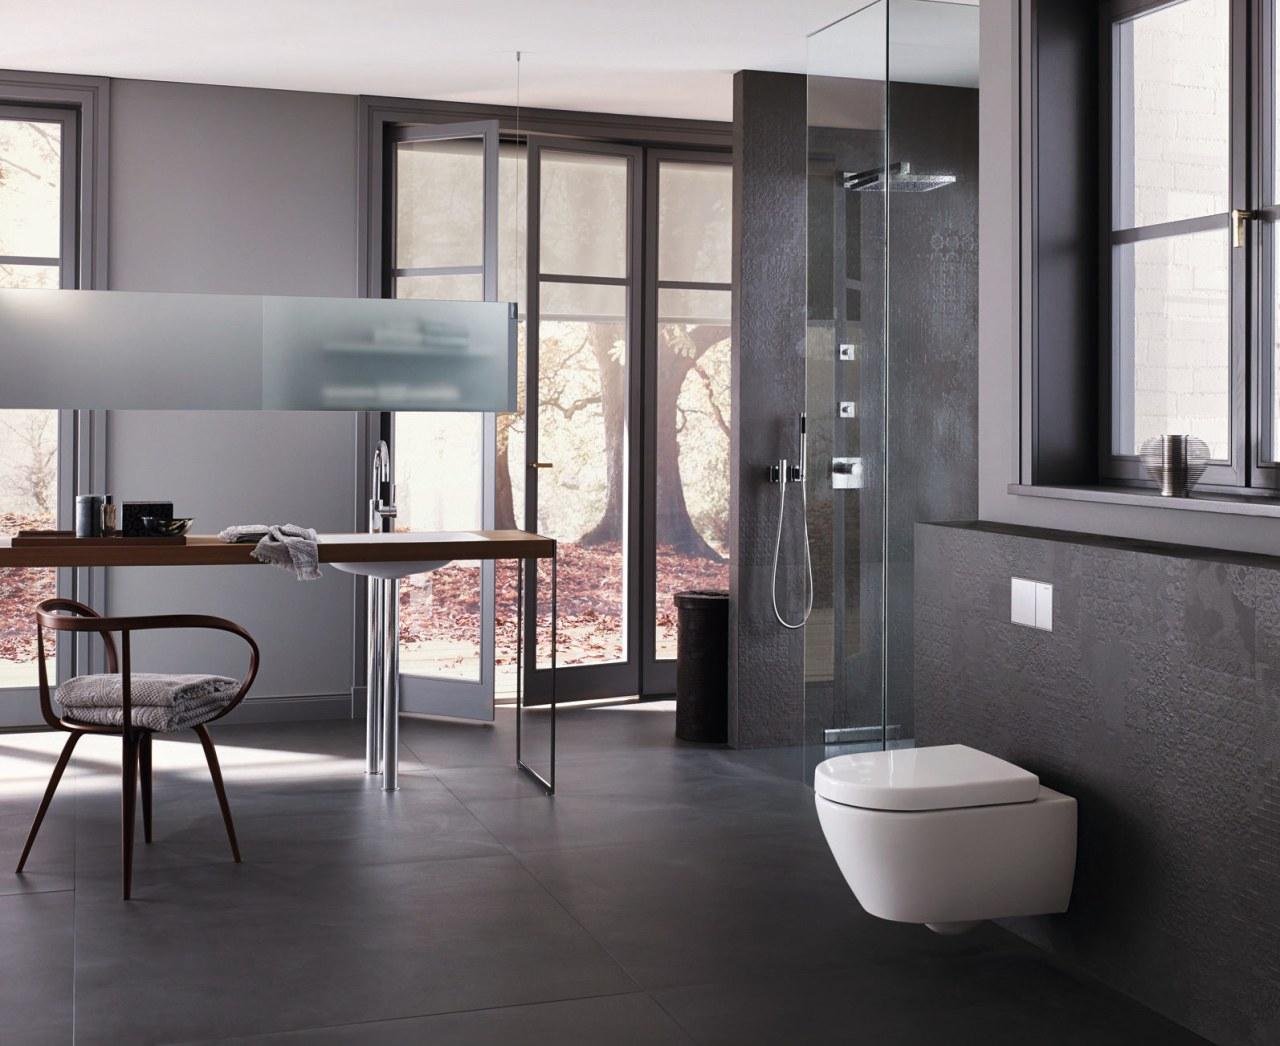 A Geberit inwall cistern and flush plate streamline bathroom, bathroom accessory, bathroom cabinet, floor, flooring, furniture, interior design, plumbing fixture, sink, tile, gray, black